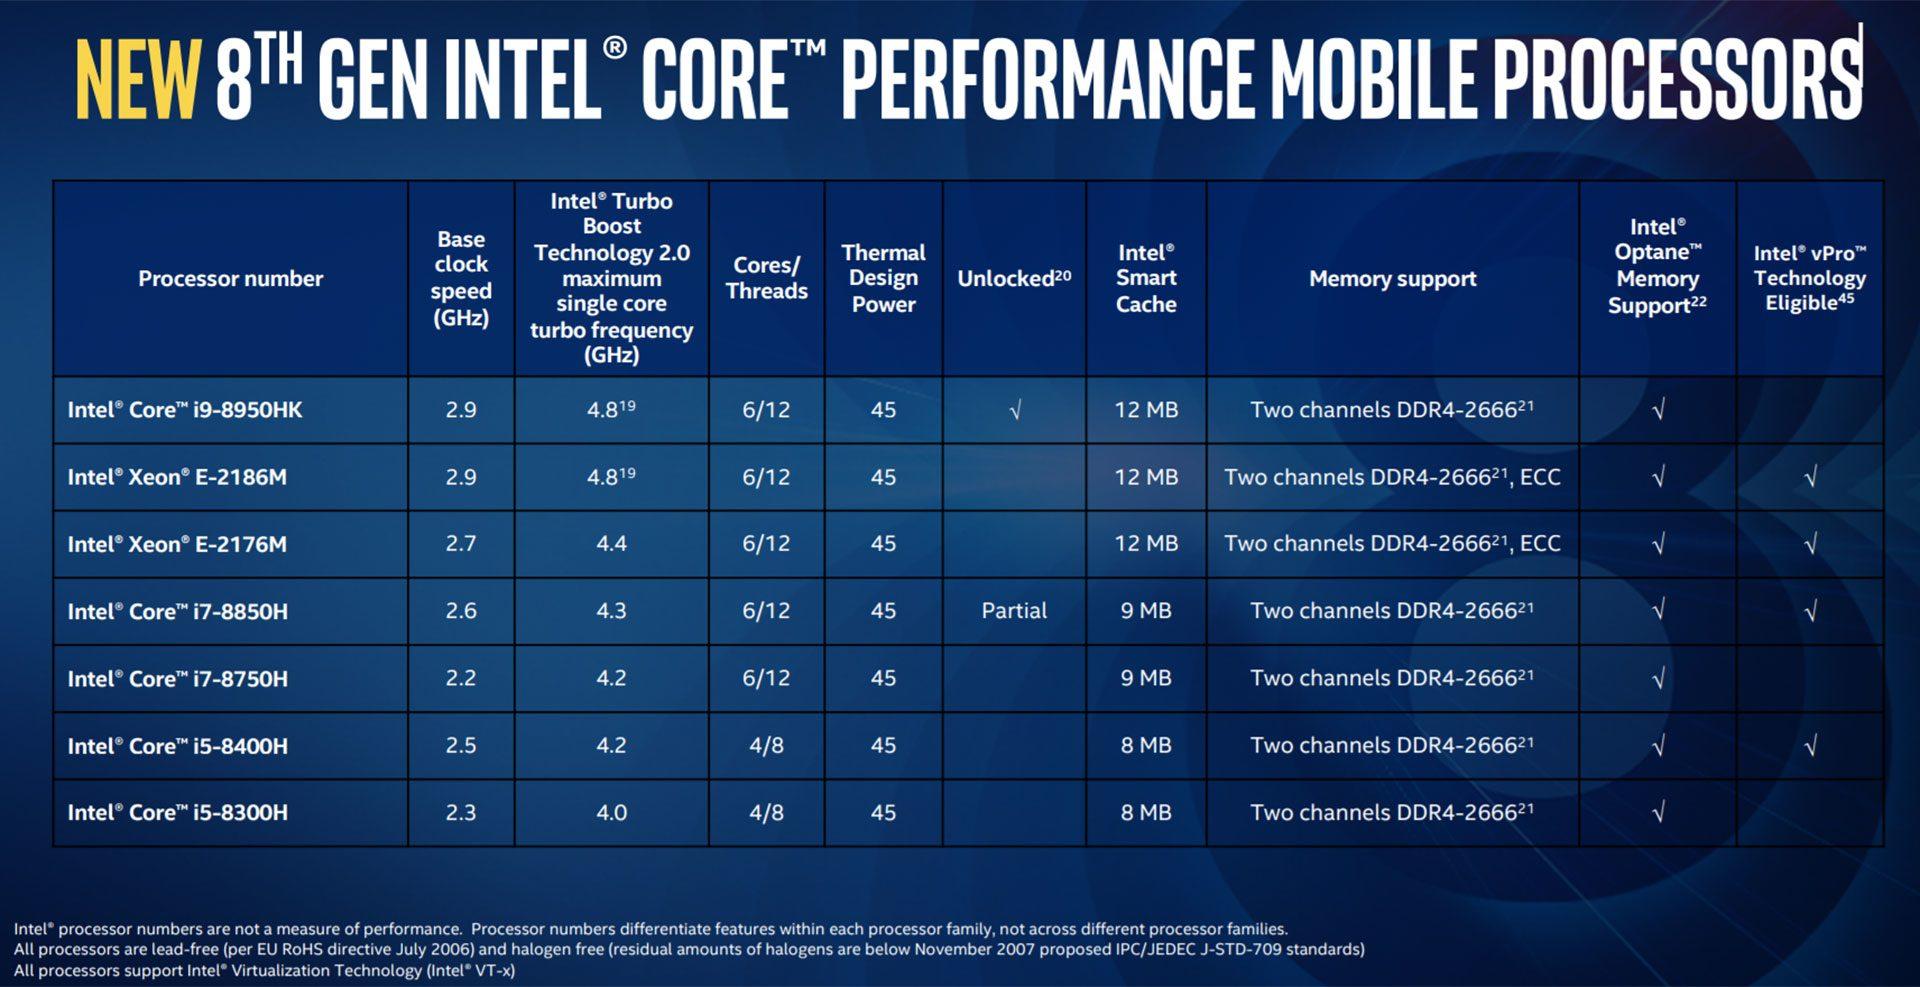 Intel Core i5-8300H benchmarks (Coffee Lake, 8th gen) vs i7